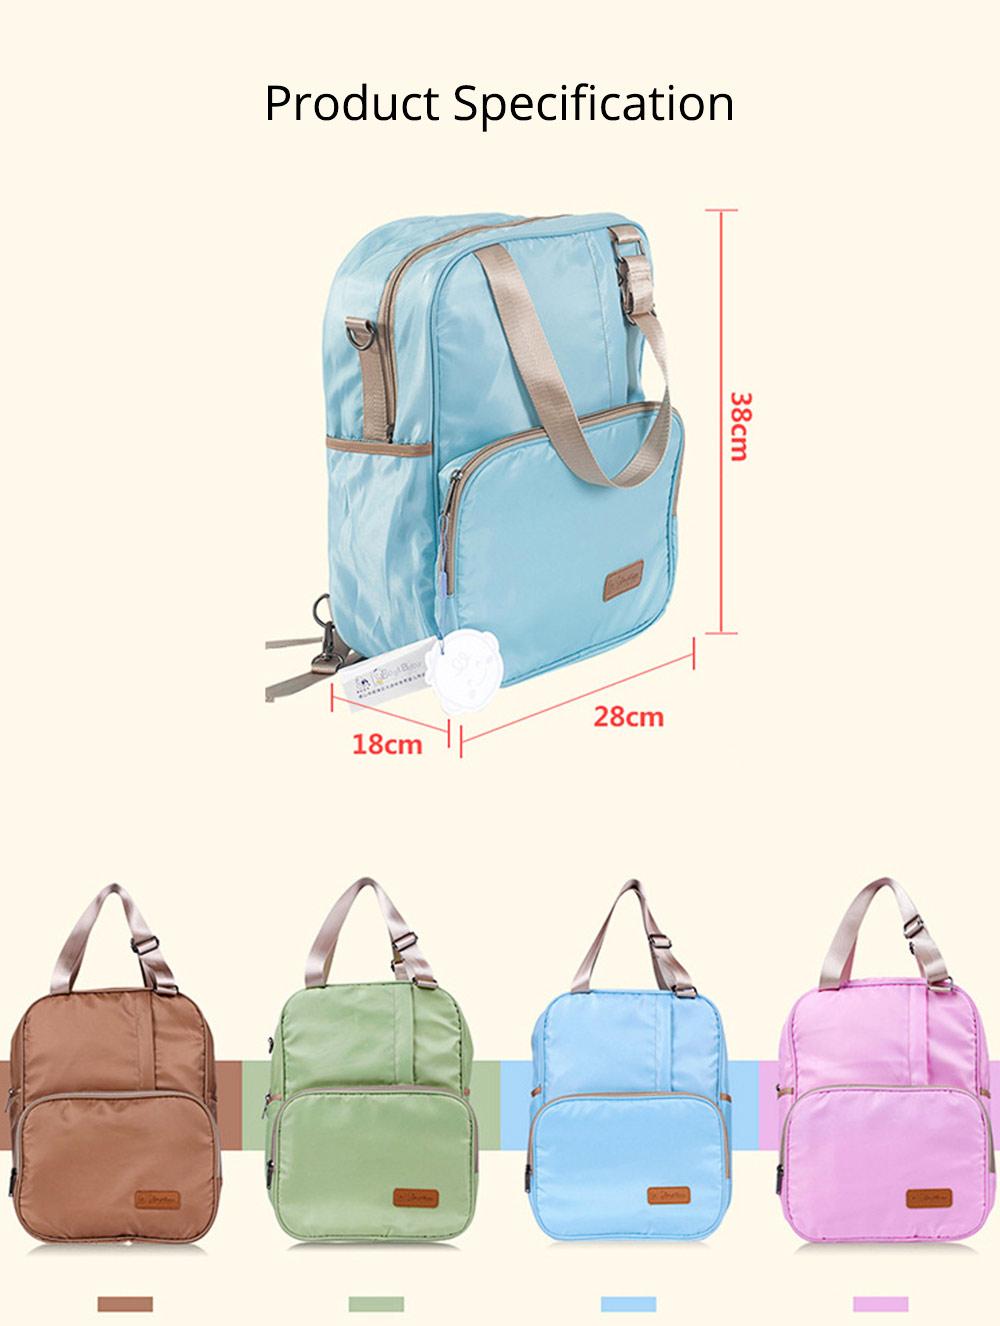 Diaper Backpack witg Large Capacity Mammy Bag, Multifunctional Travel Nappy Bag Fashionable Mommy Bag 9